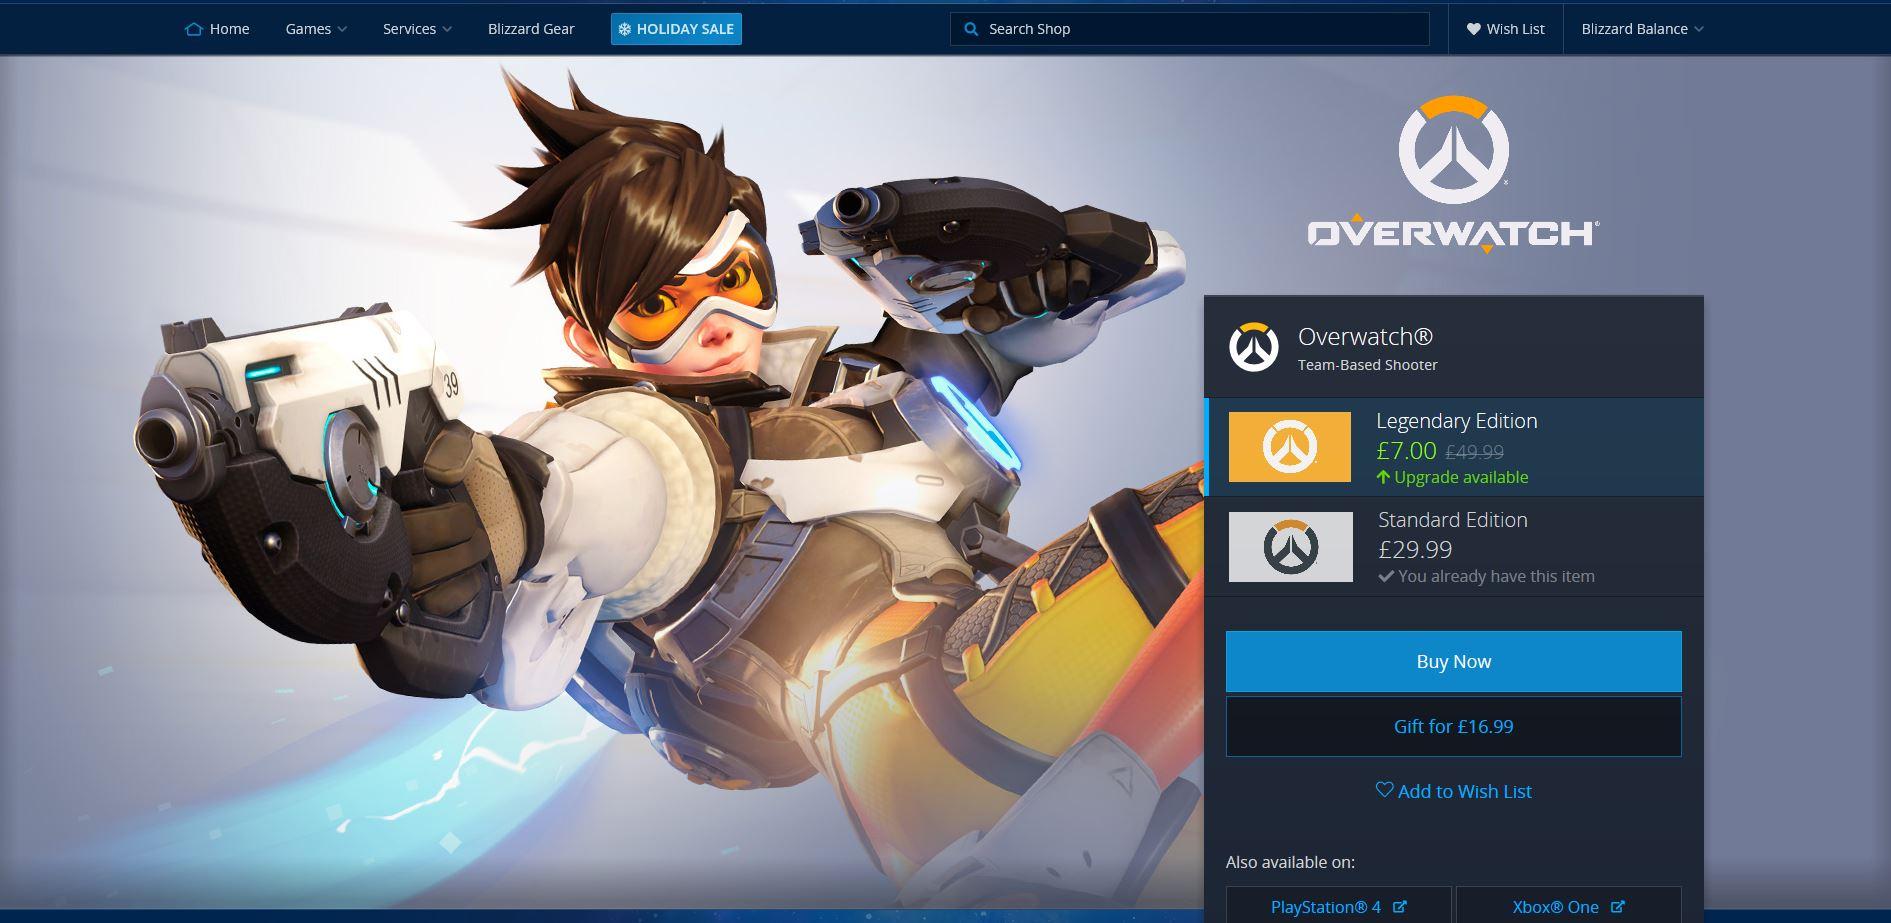 Overwatch Legendary Edition Upgrade PC - £7: Blizzard Store